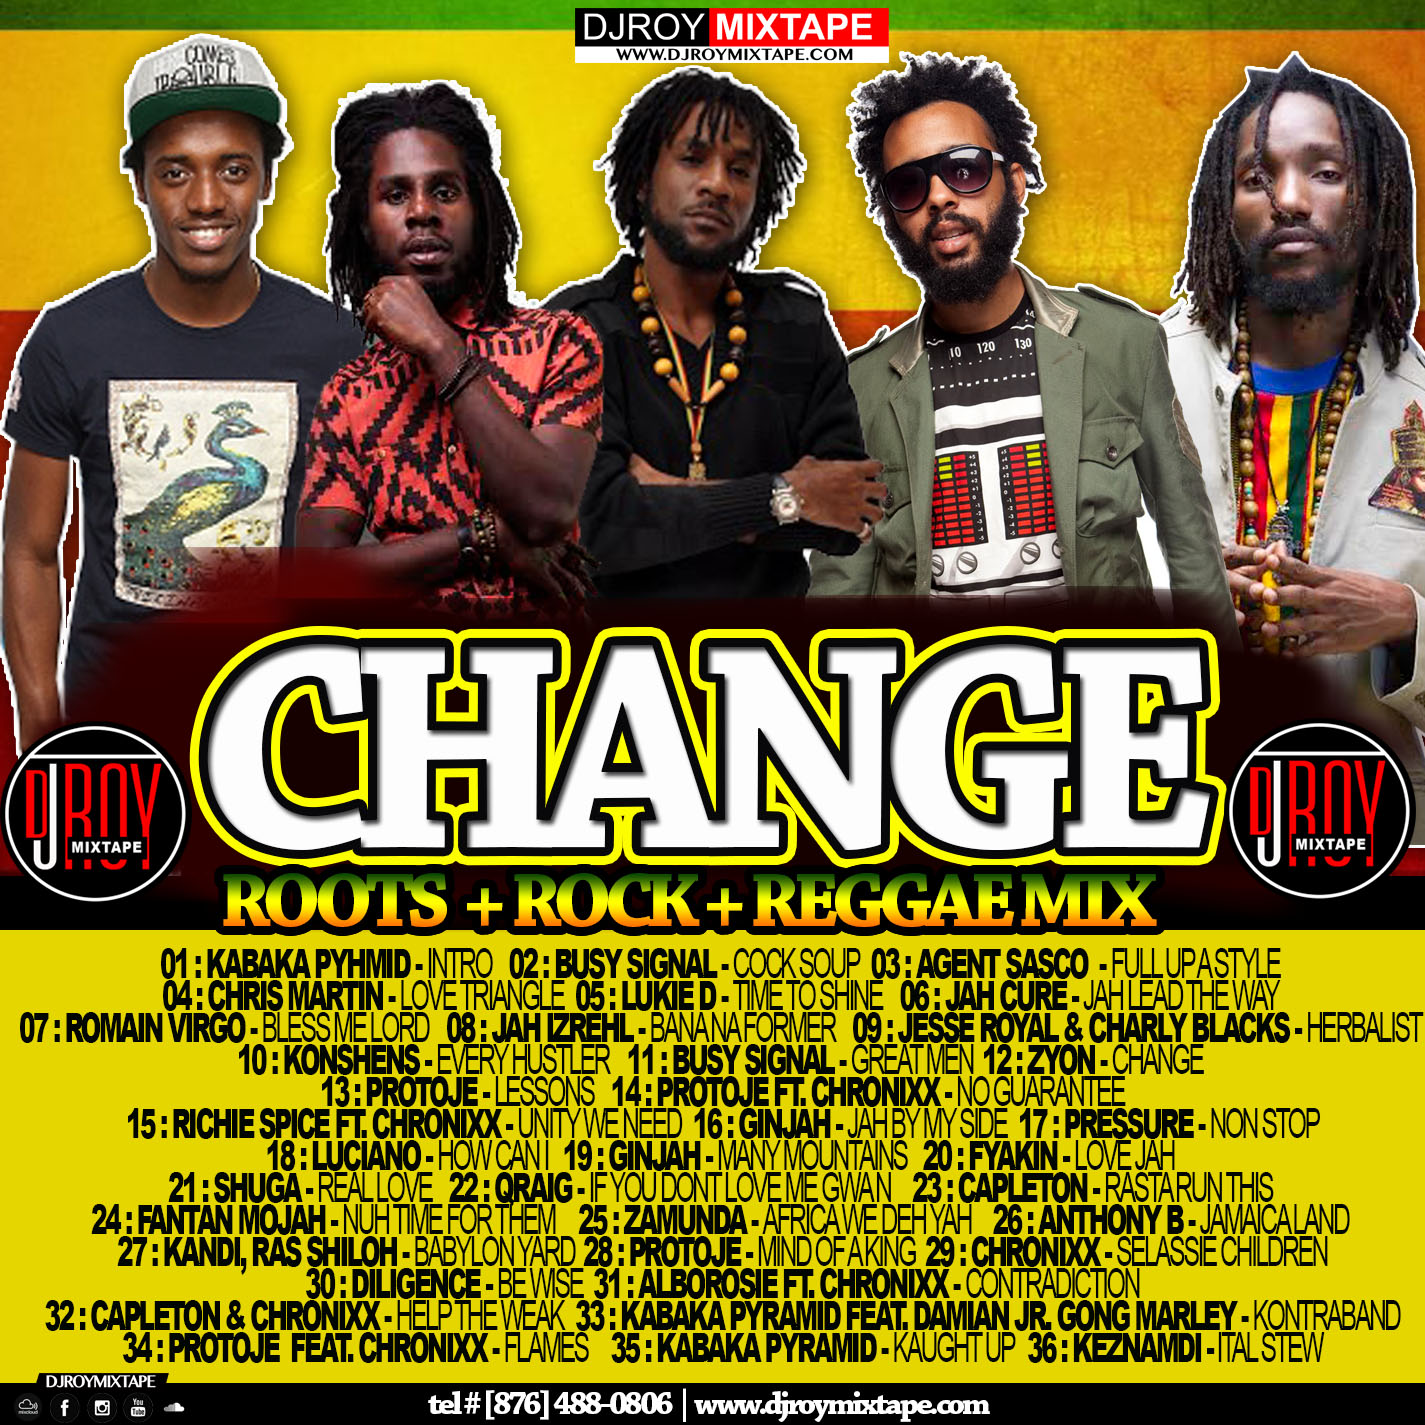 DJROYMIXTAPE : DJ ROY CHANGE ROOTS ROCK REGGAE MIX [JULY 2018]